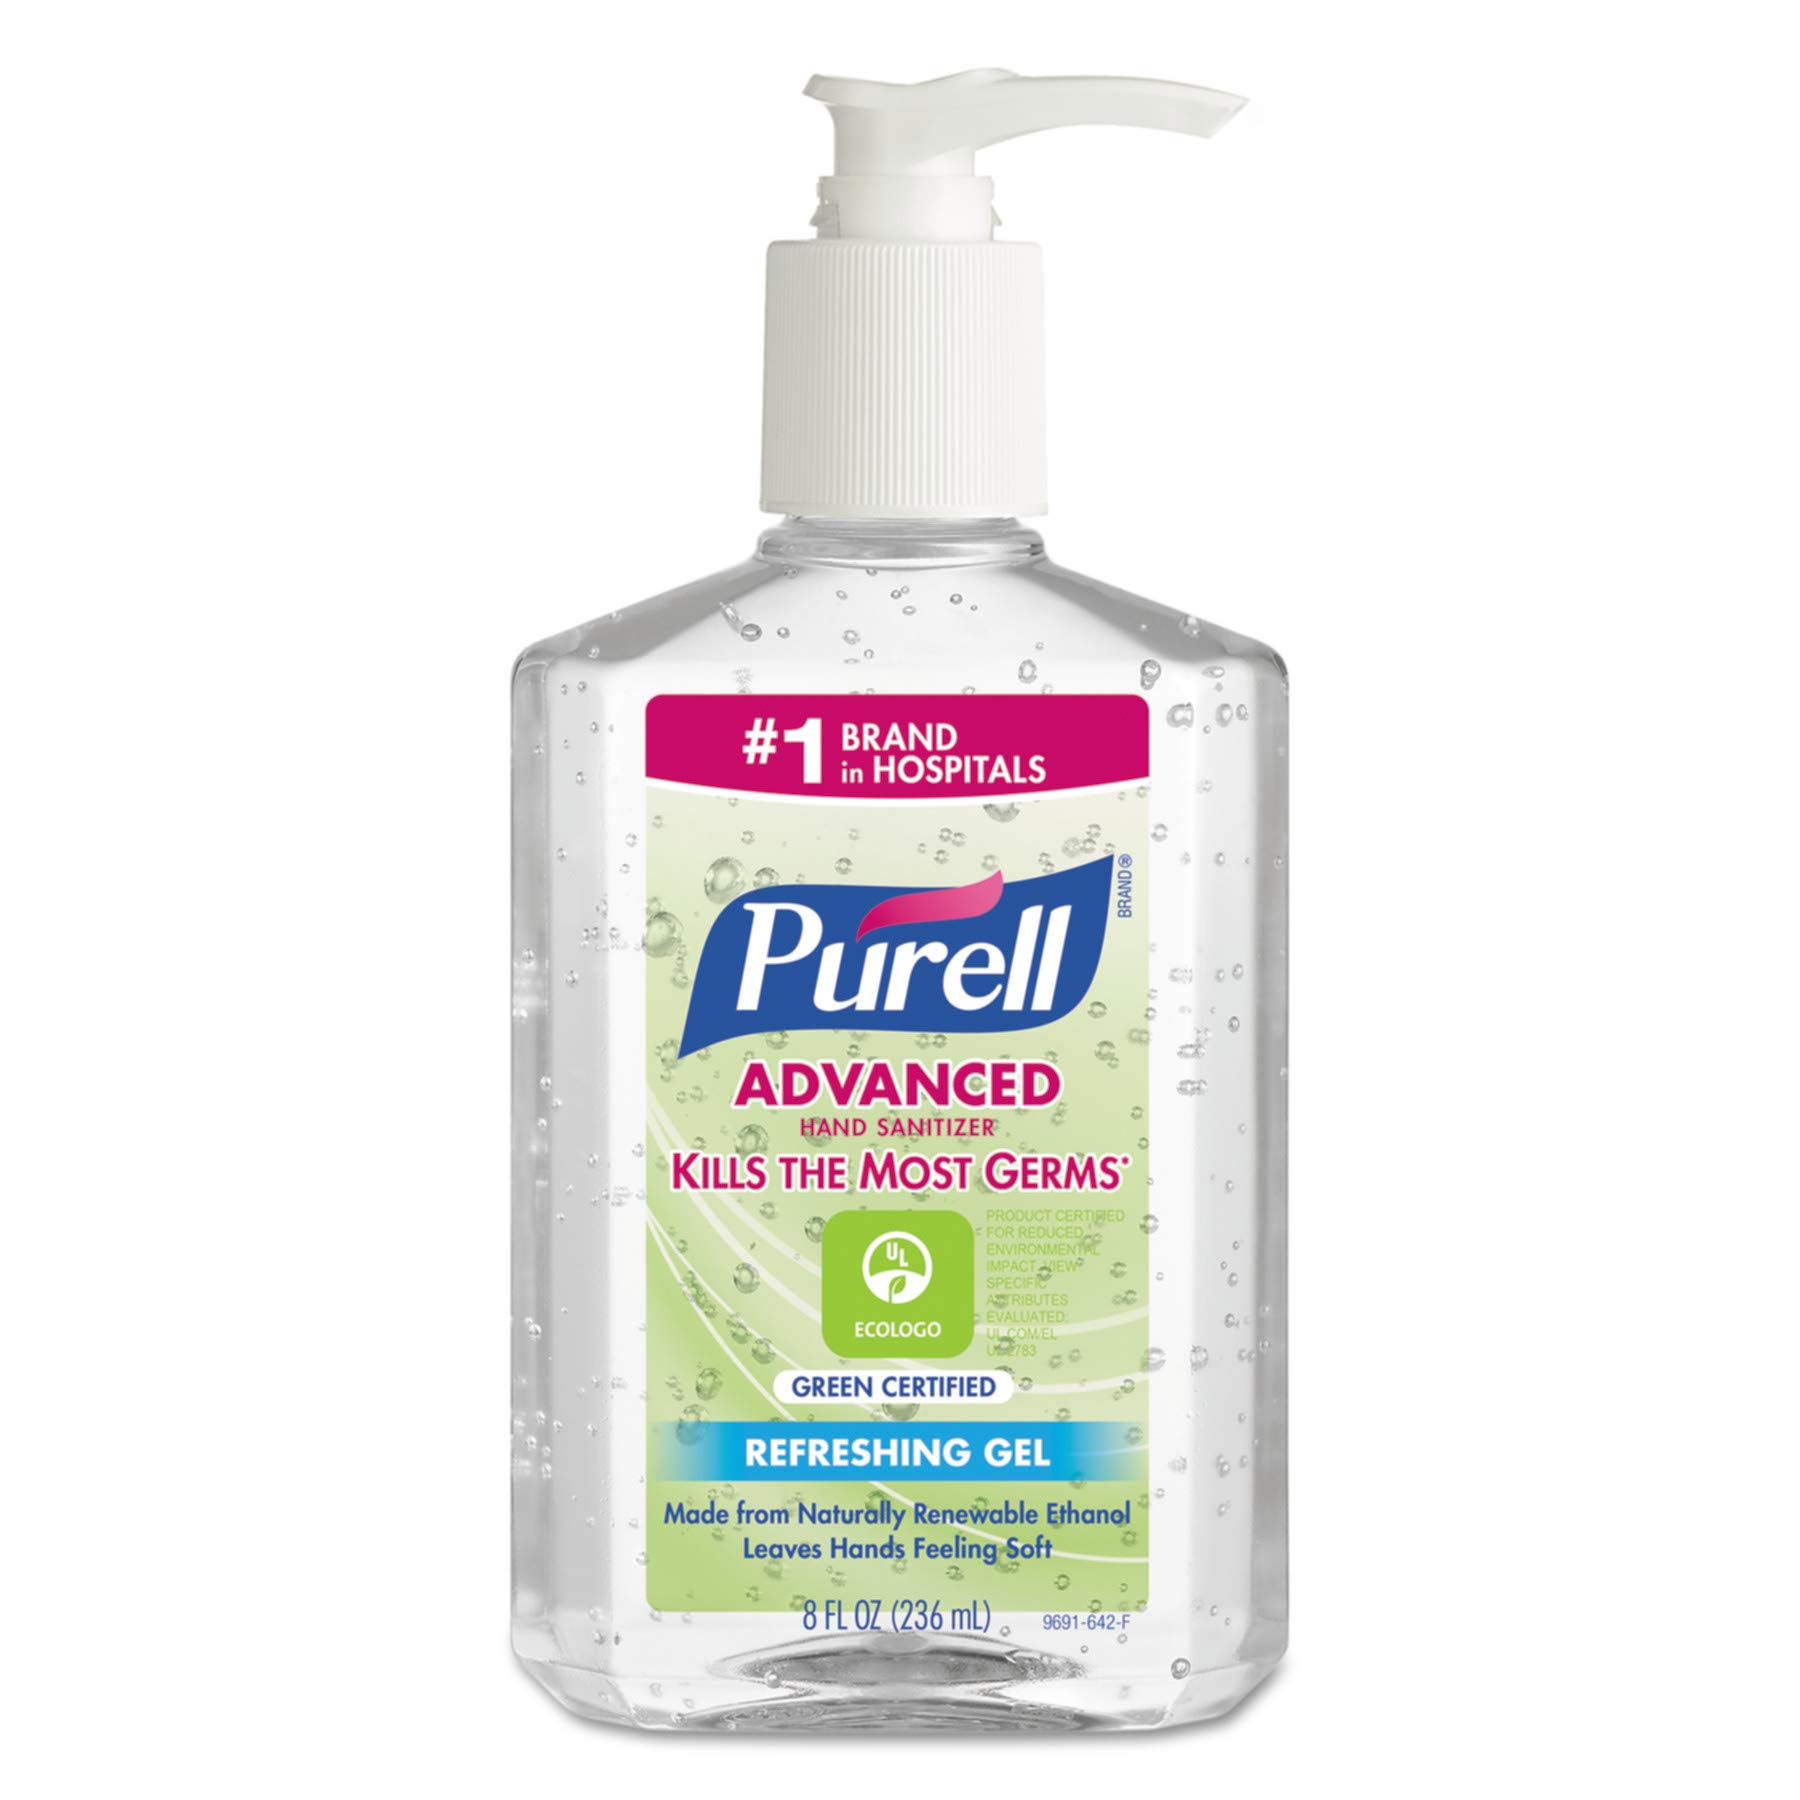 PURELL Advanced Hand Sanitizer Green Certified Gel, Fragrance Free, 8 fl oz EcoLogo Certified Hand Sanitizer Table Top Pump Bottles (Case of 12) - 9691-12